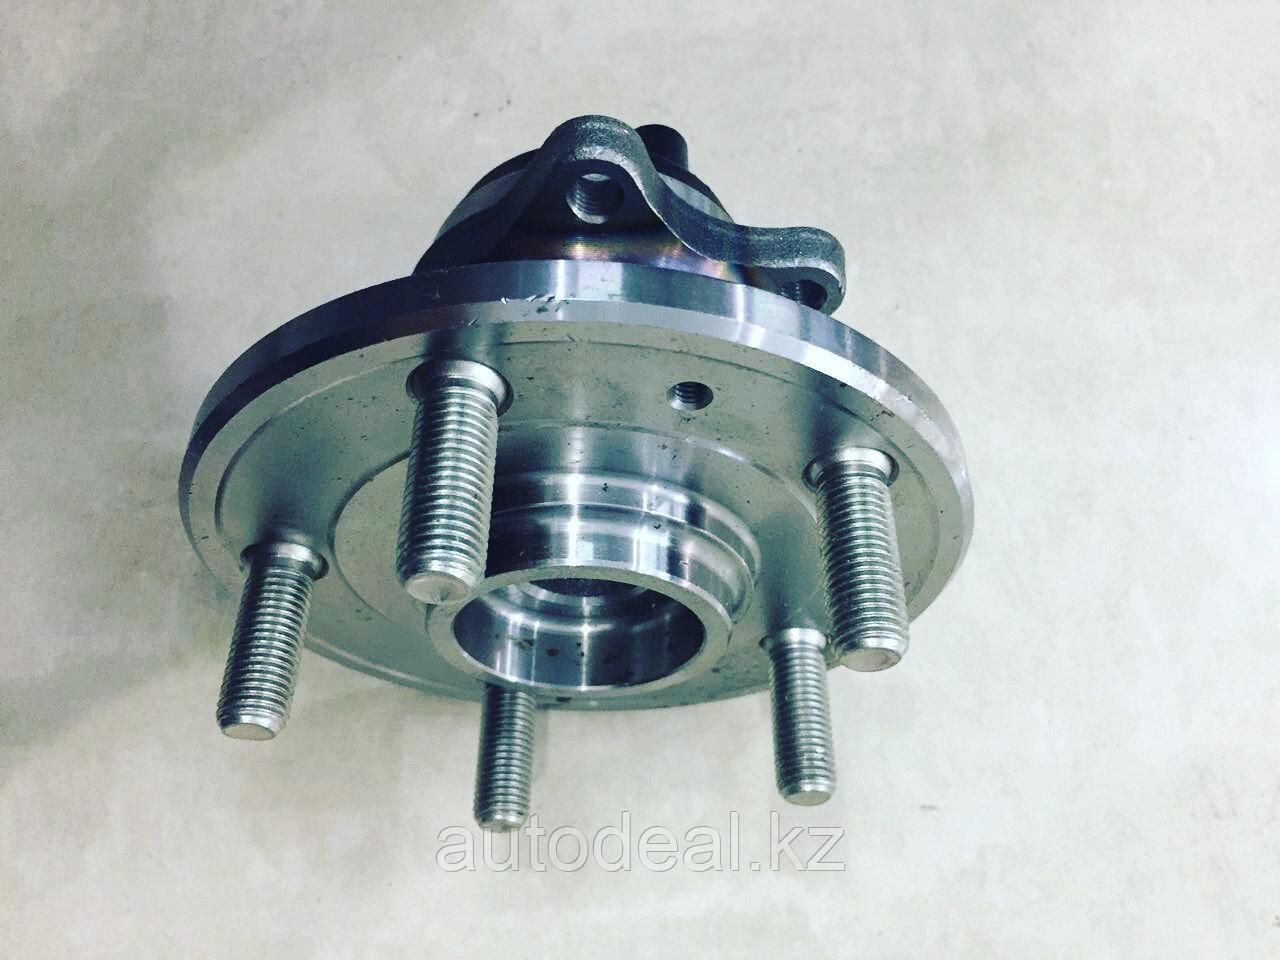 Ступица задняя (в сборе с подшипником, с АБС) JAC S3 / Rear wheel hub assembly with bearing